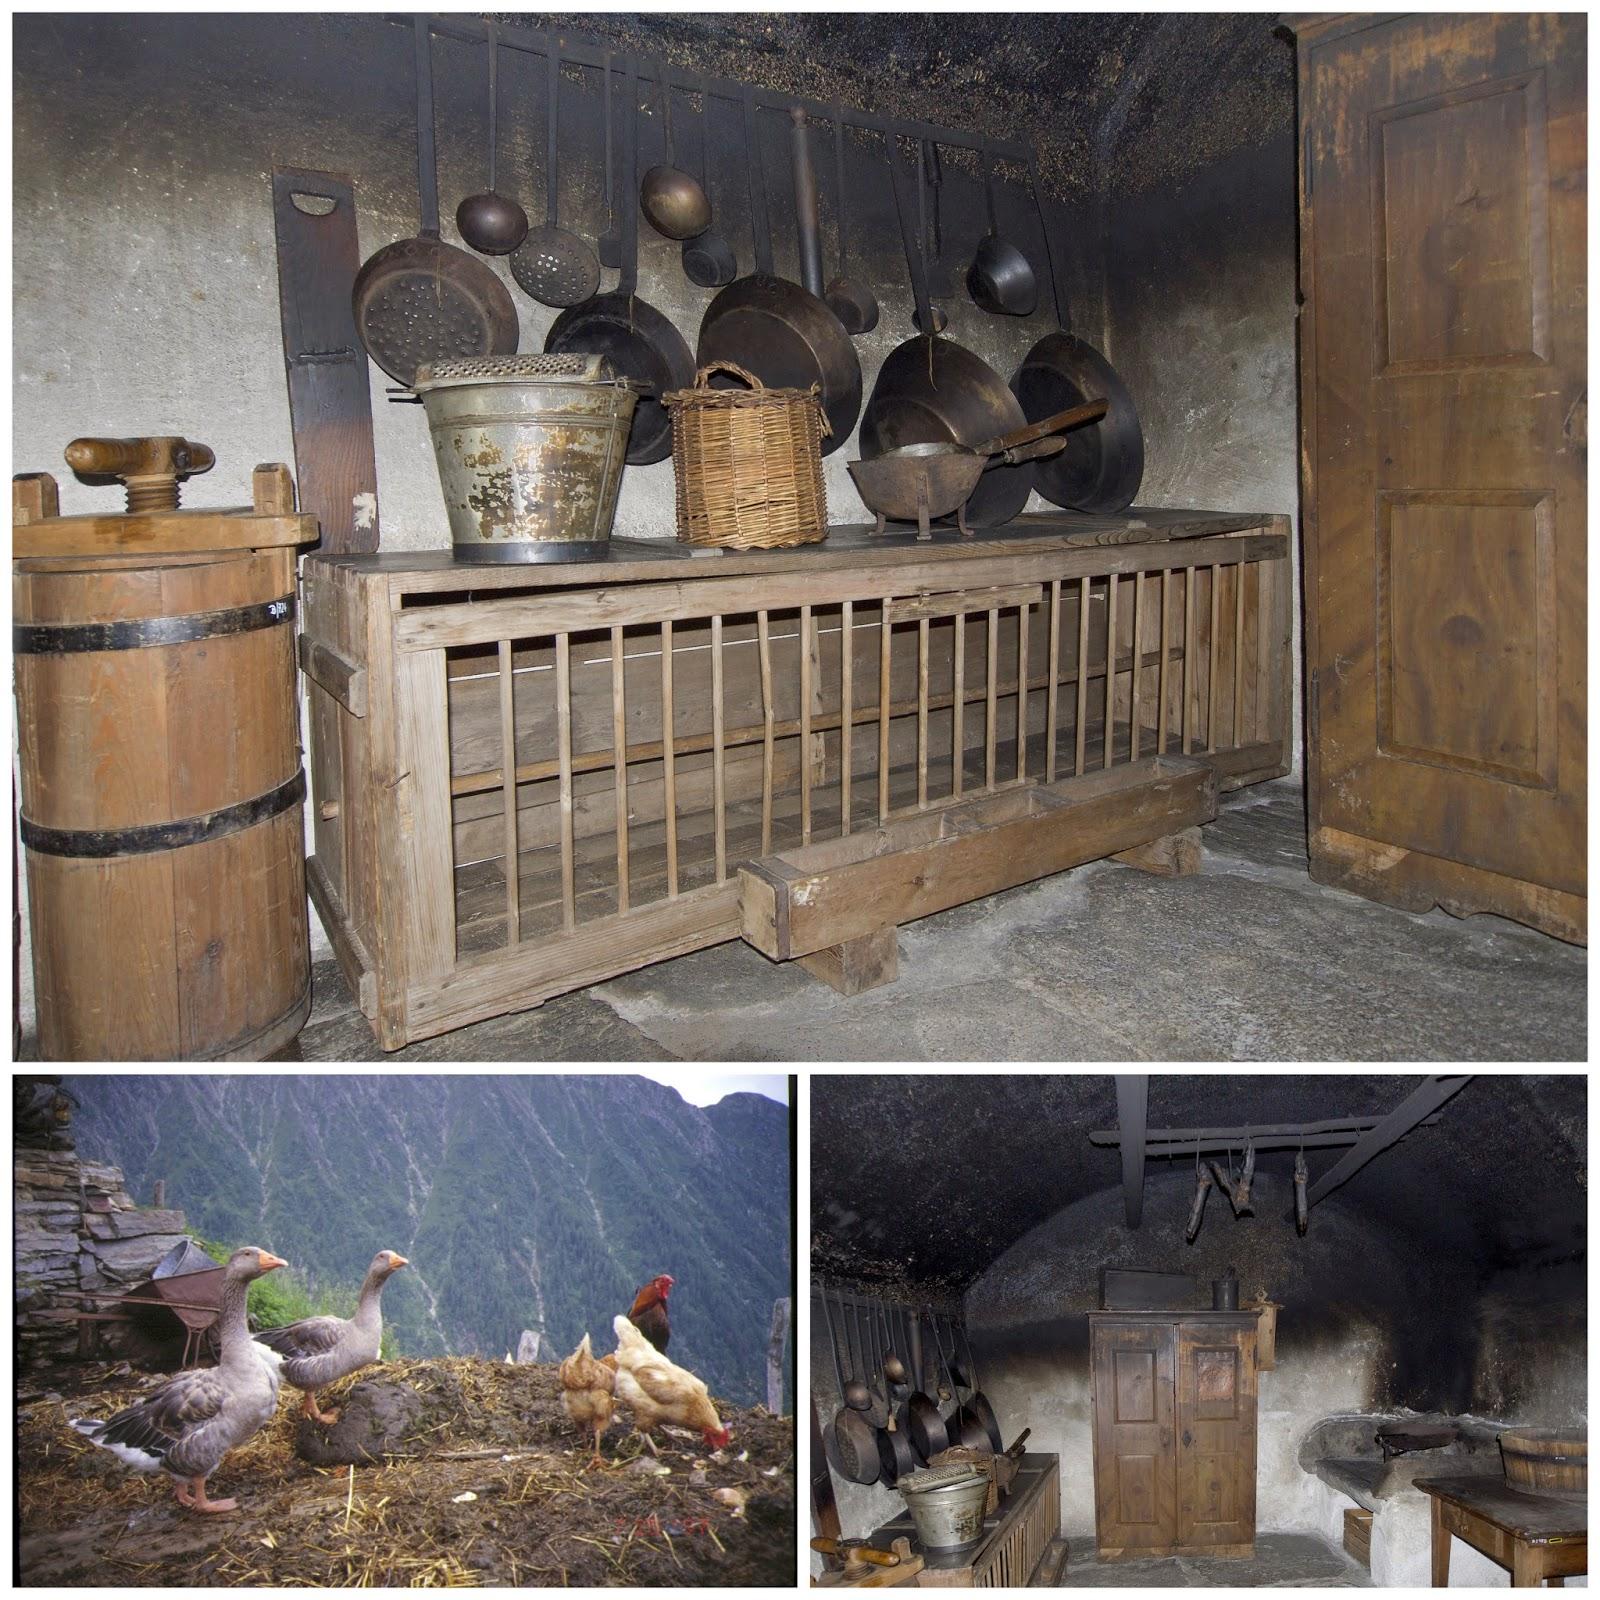 galline ovaiole in cucina